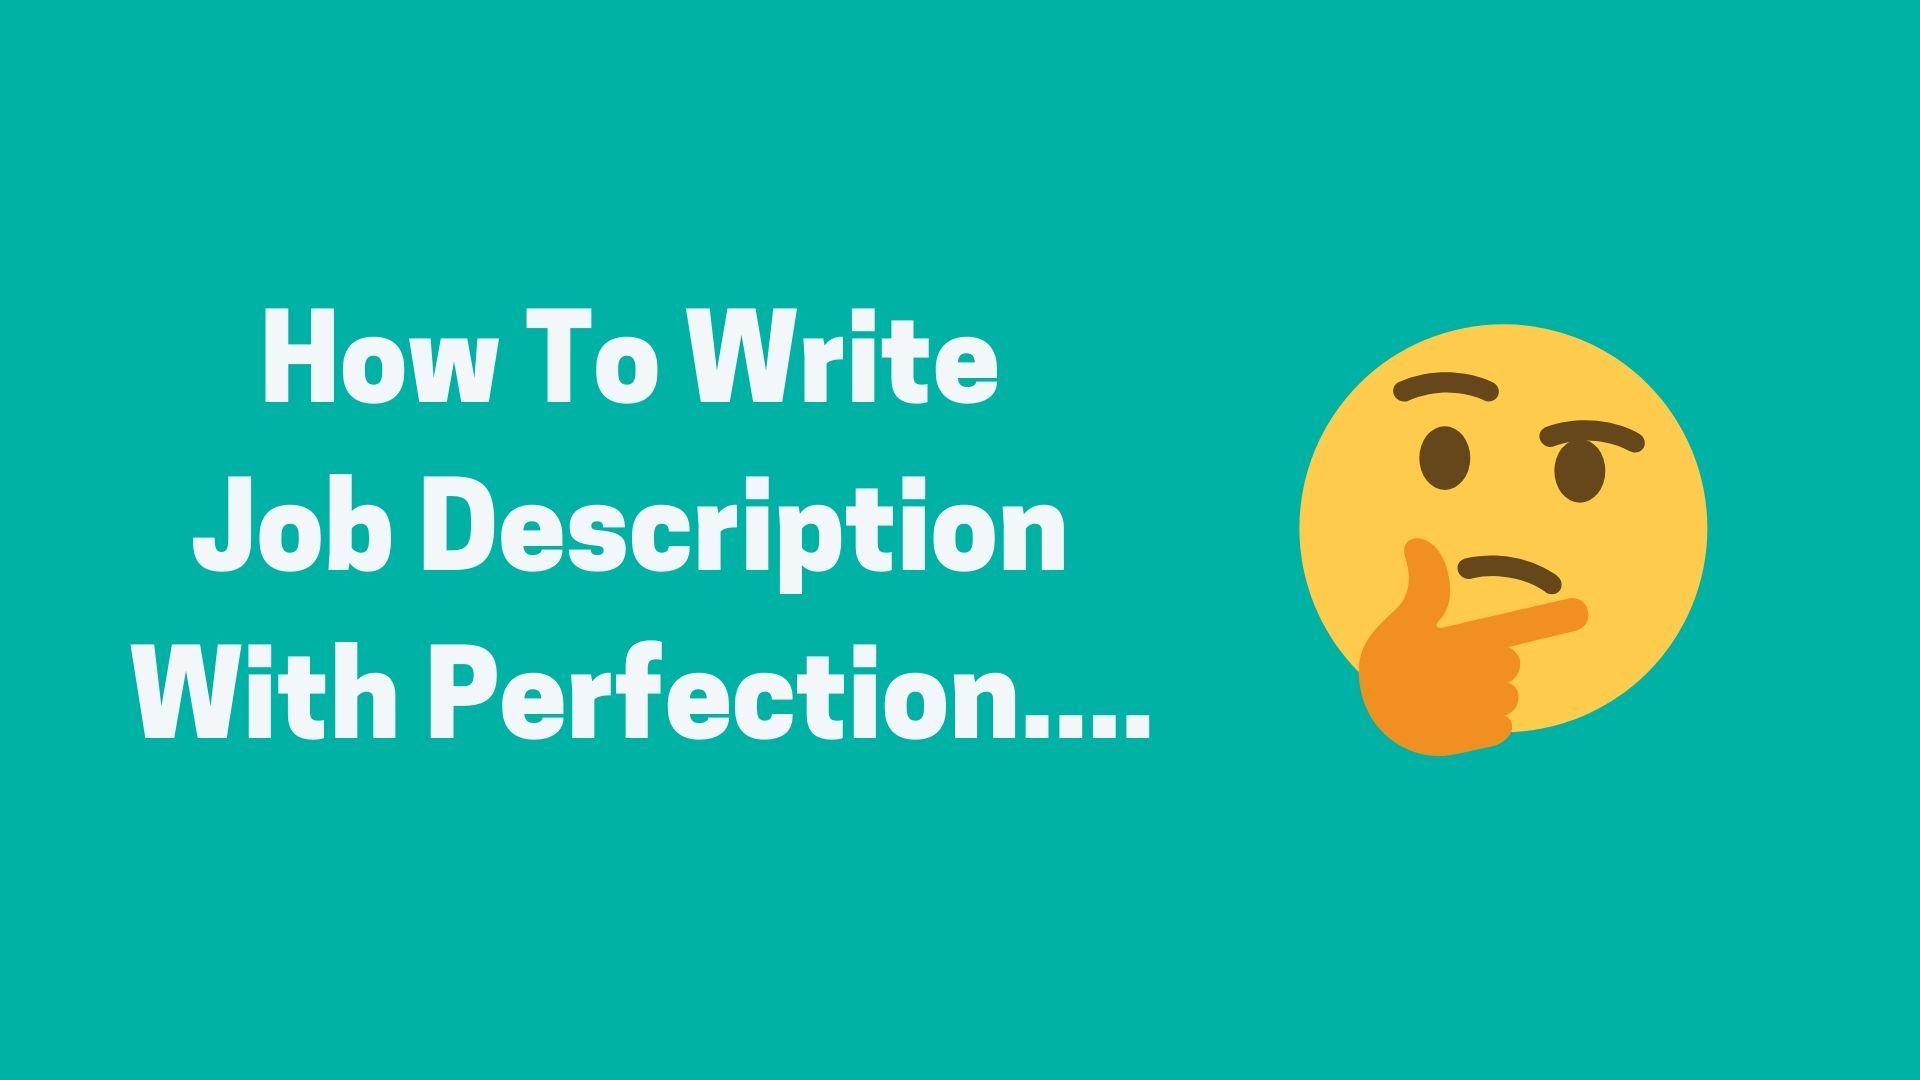 How to write perfect job description